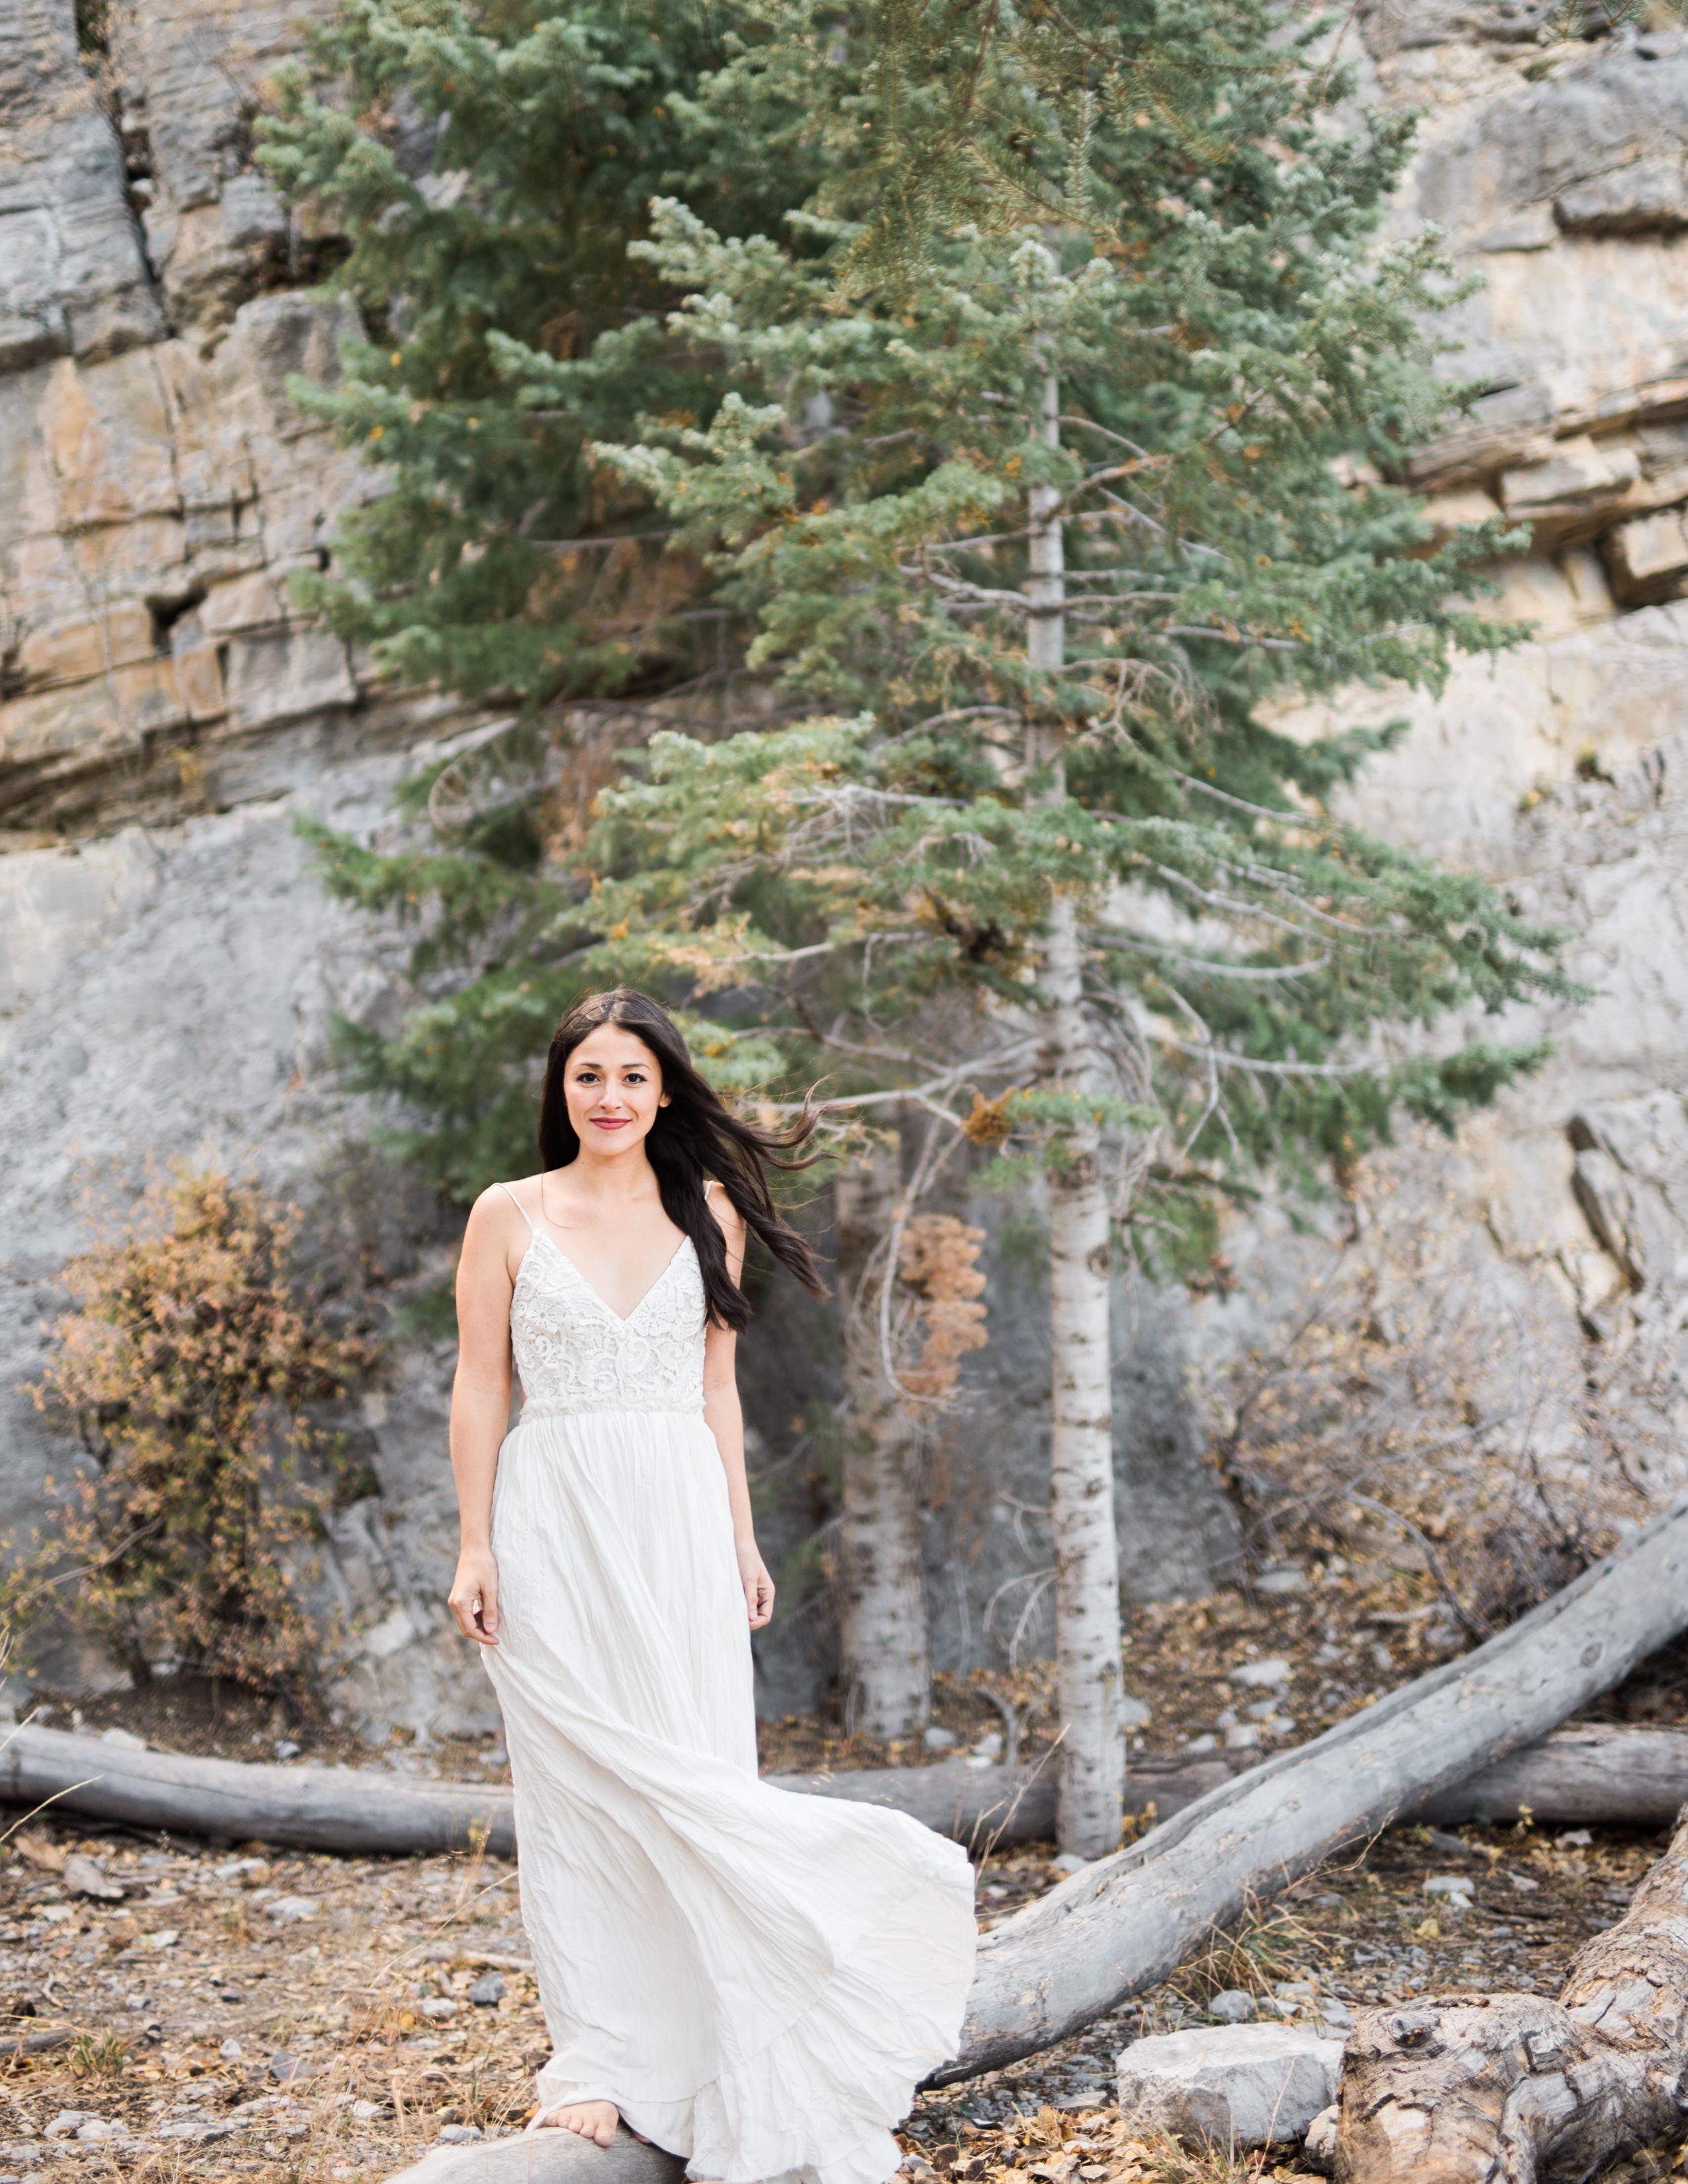 Las Vegas Wedding Photographer In 2019 Las Vegas Elopement